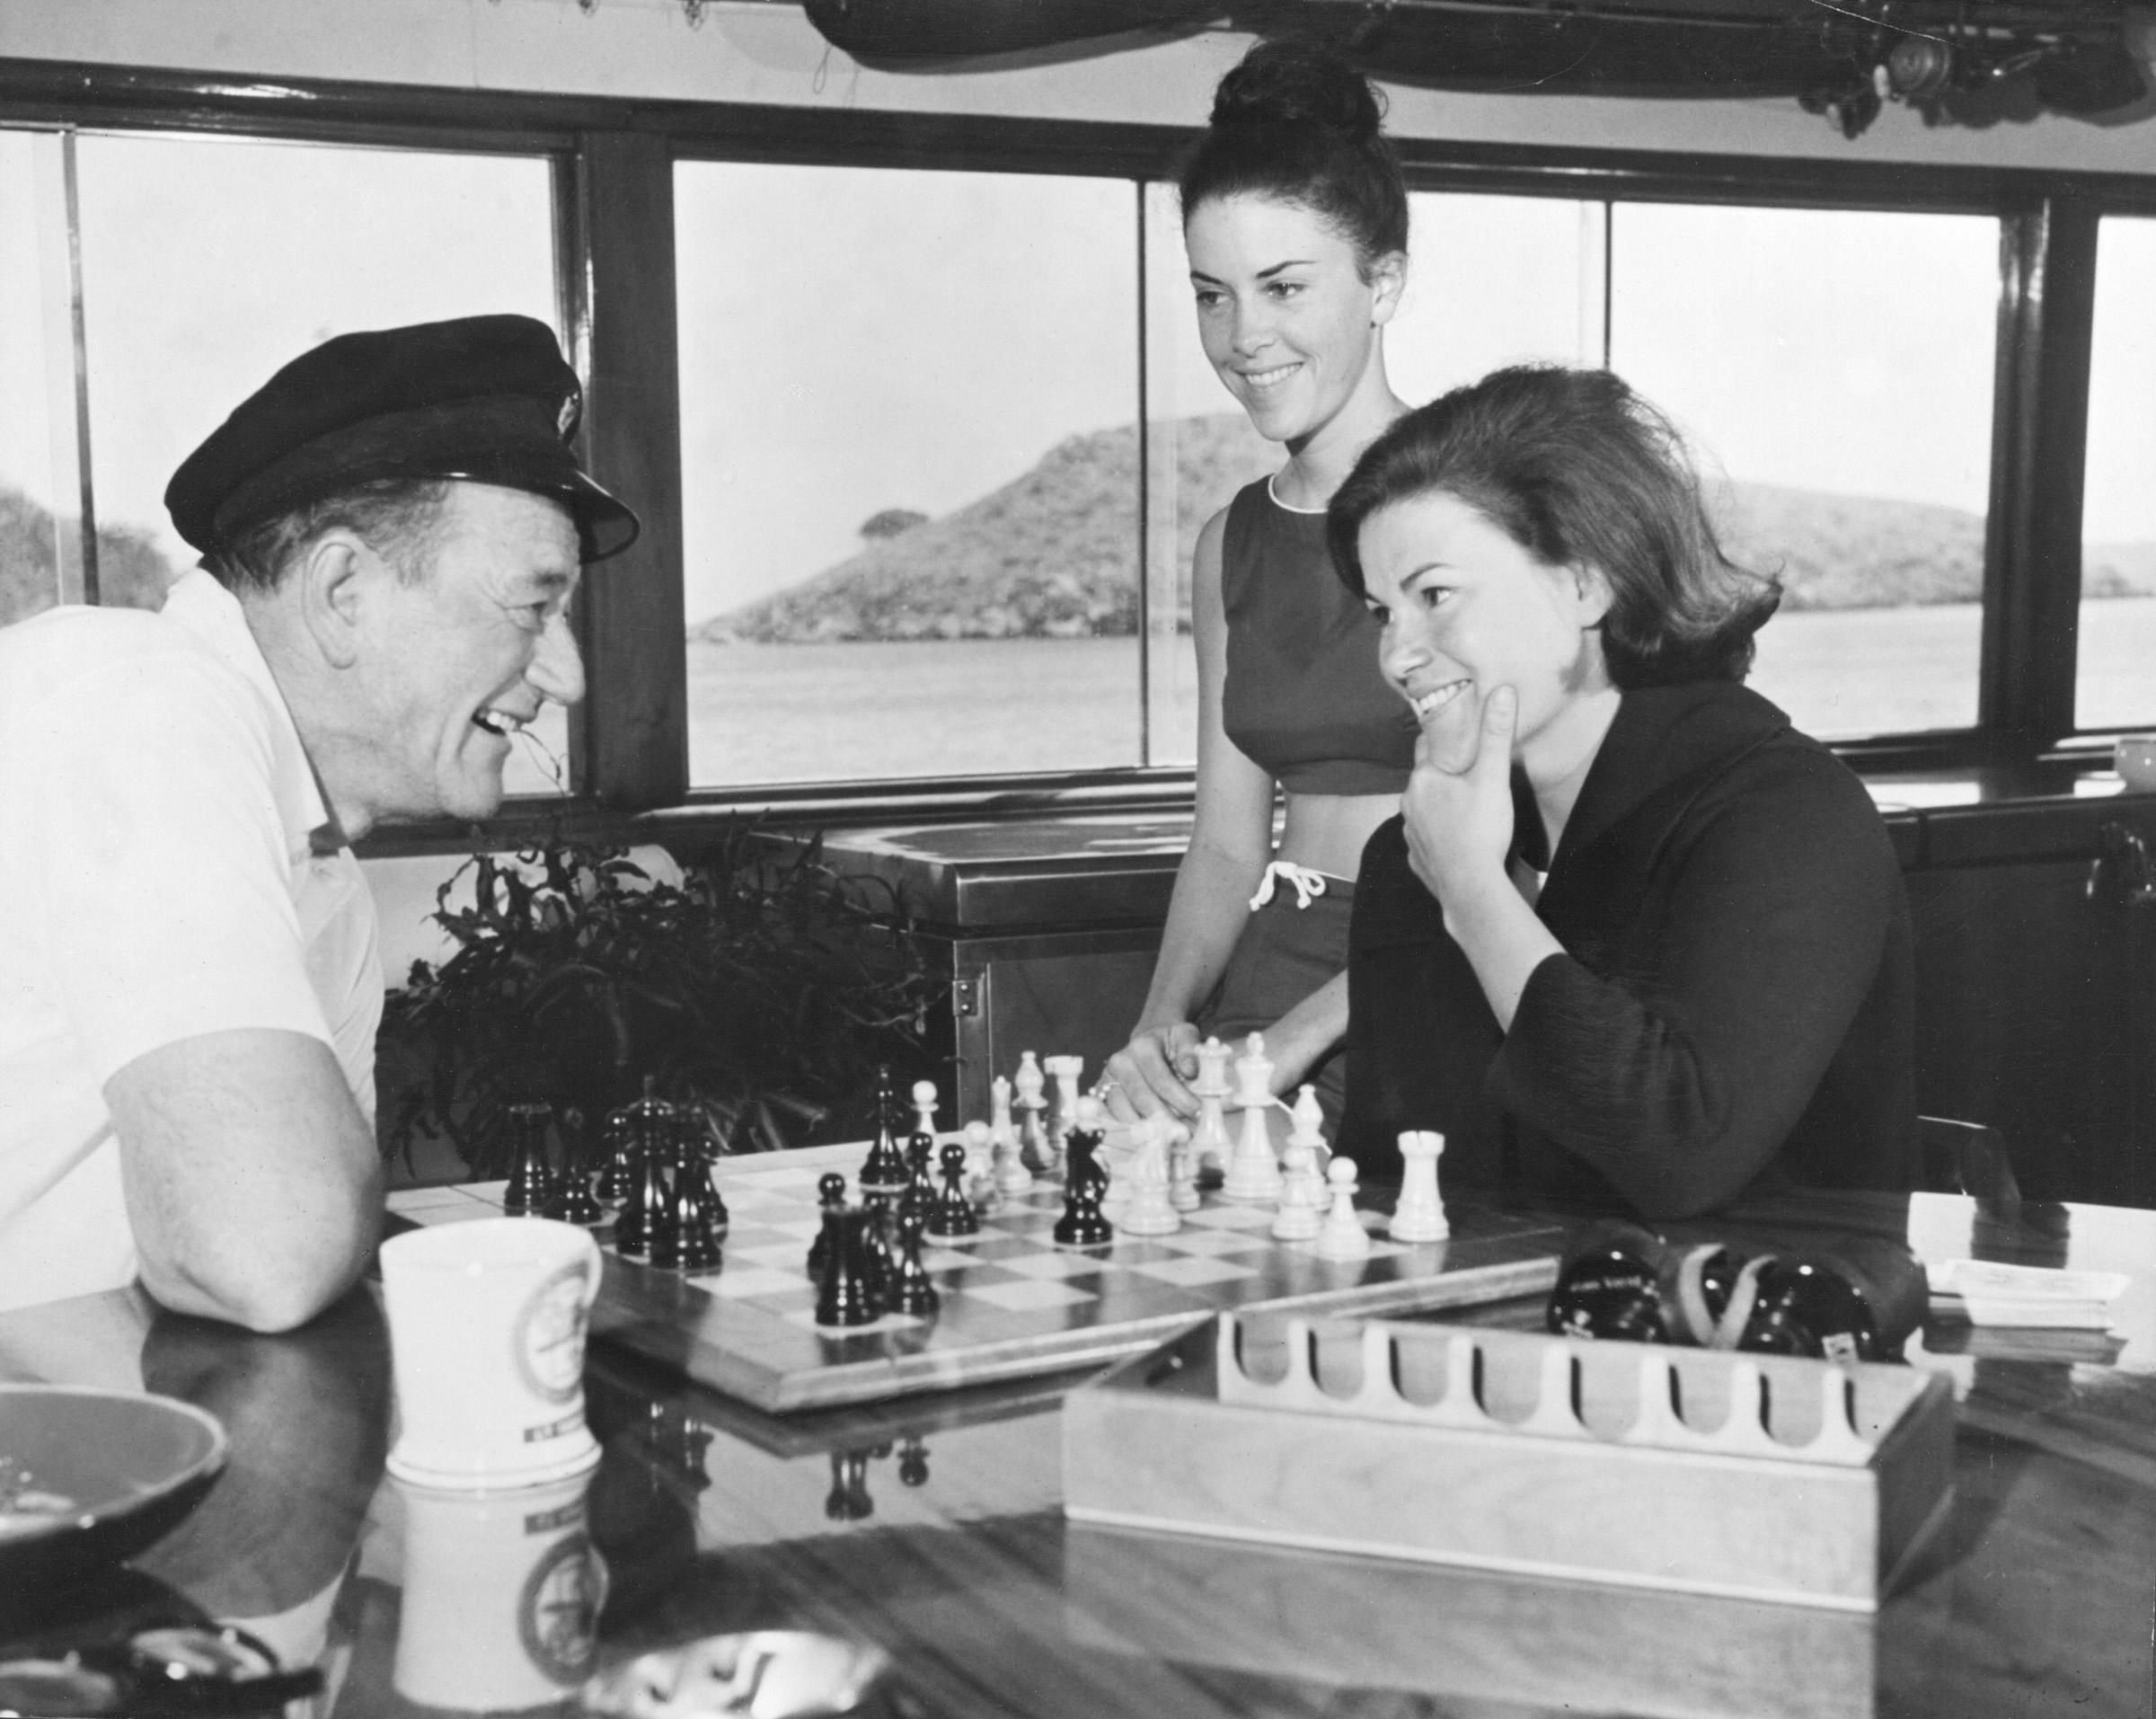 John Wayne, Peggy Wayne, and Melinda Wayne aboard the Wild Goose in 1963. Photo courtesy of John Wayne Enterprises